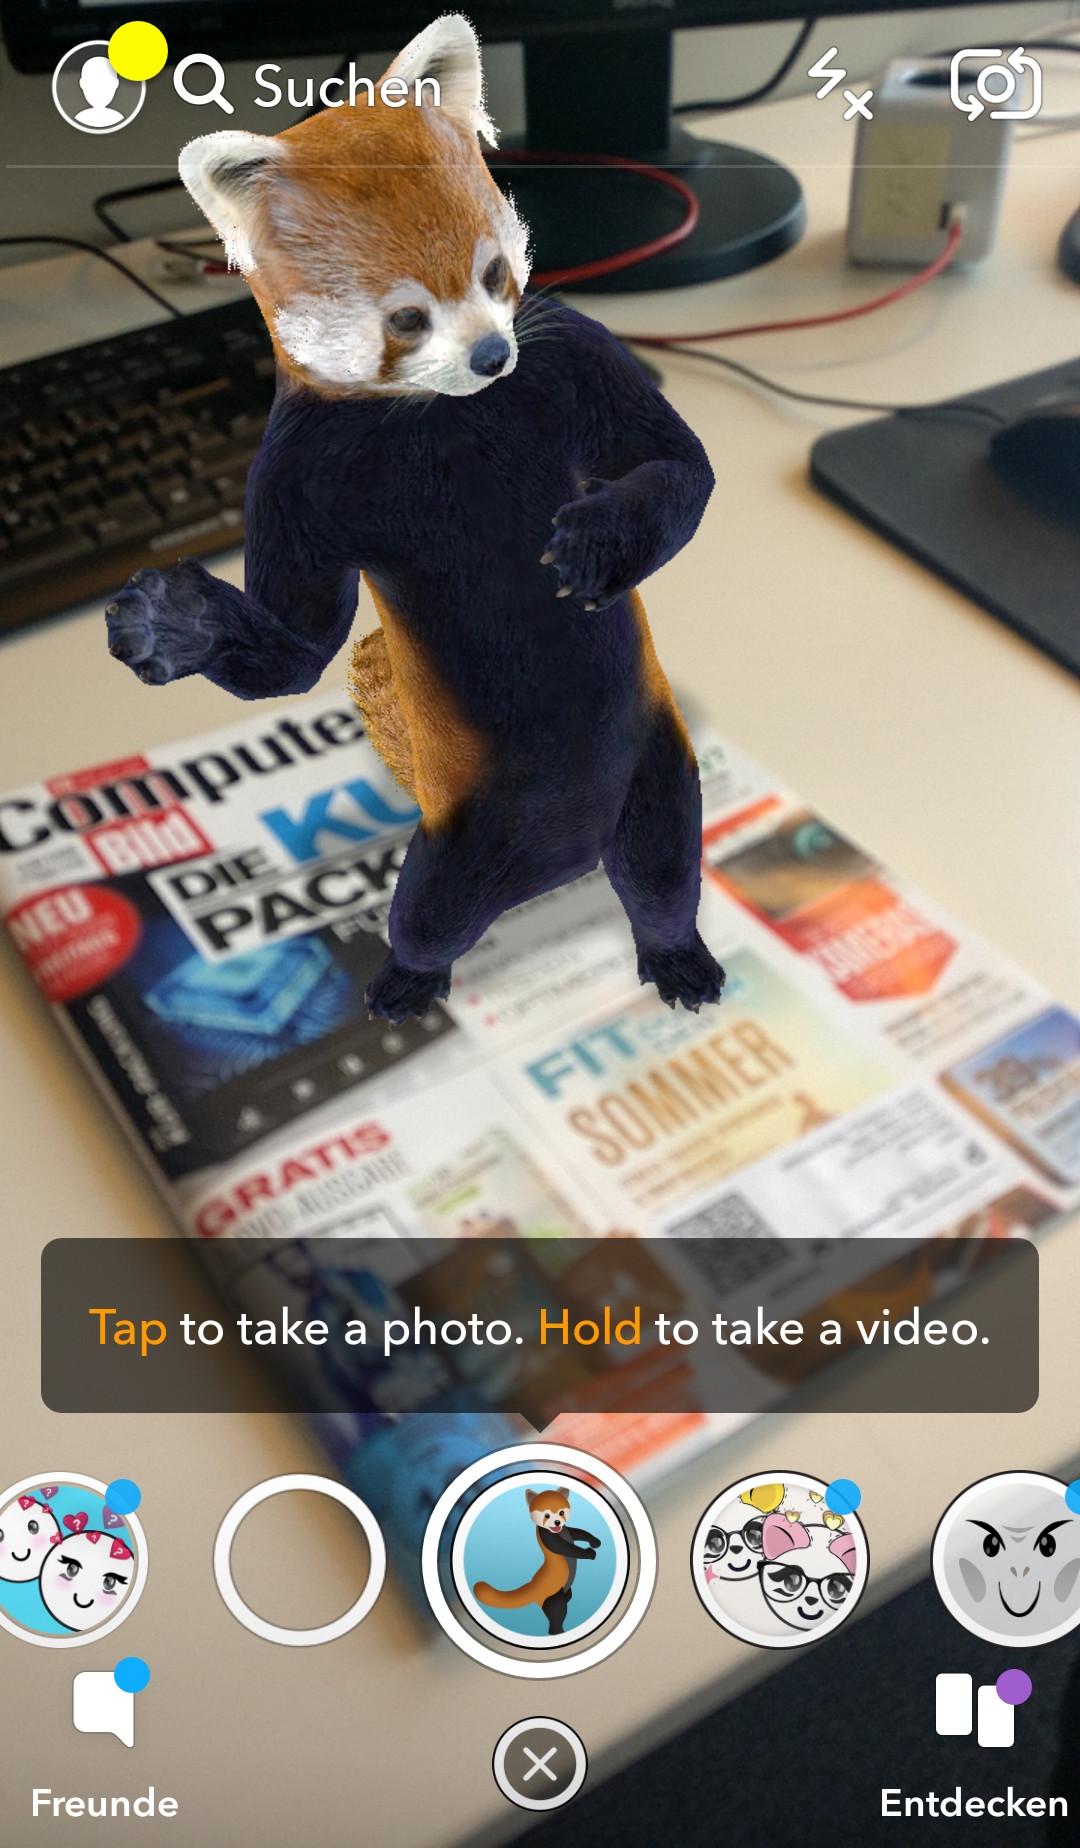 Screenshot 1 - Snapchat (App für iPhone & iPad)